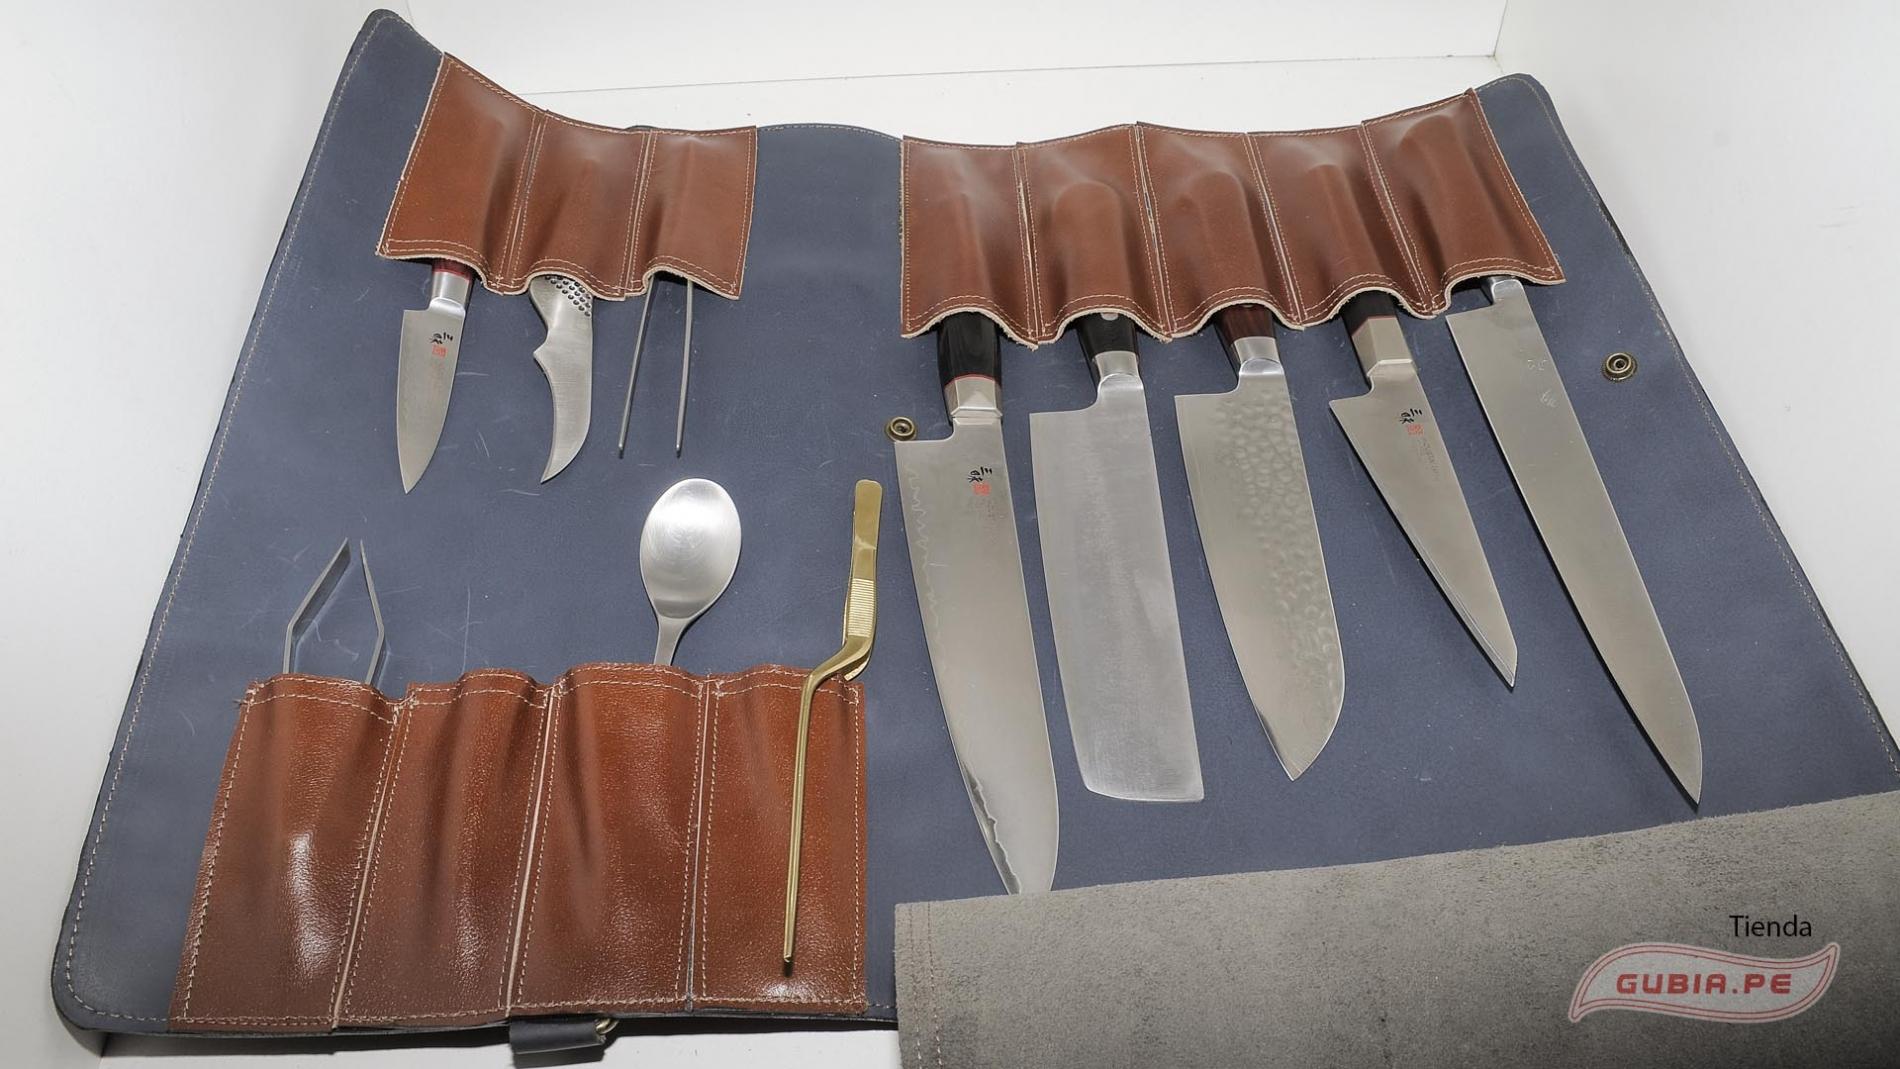 GUB0080-Maletin de cuero para cuchillos -max-4.